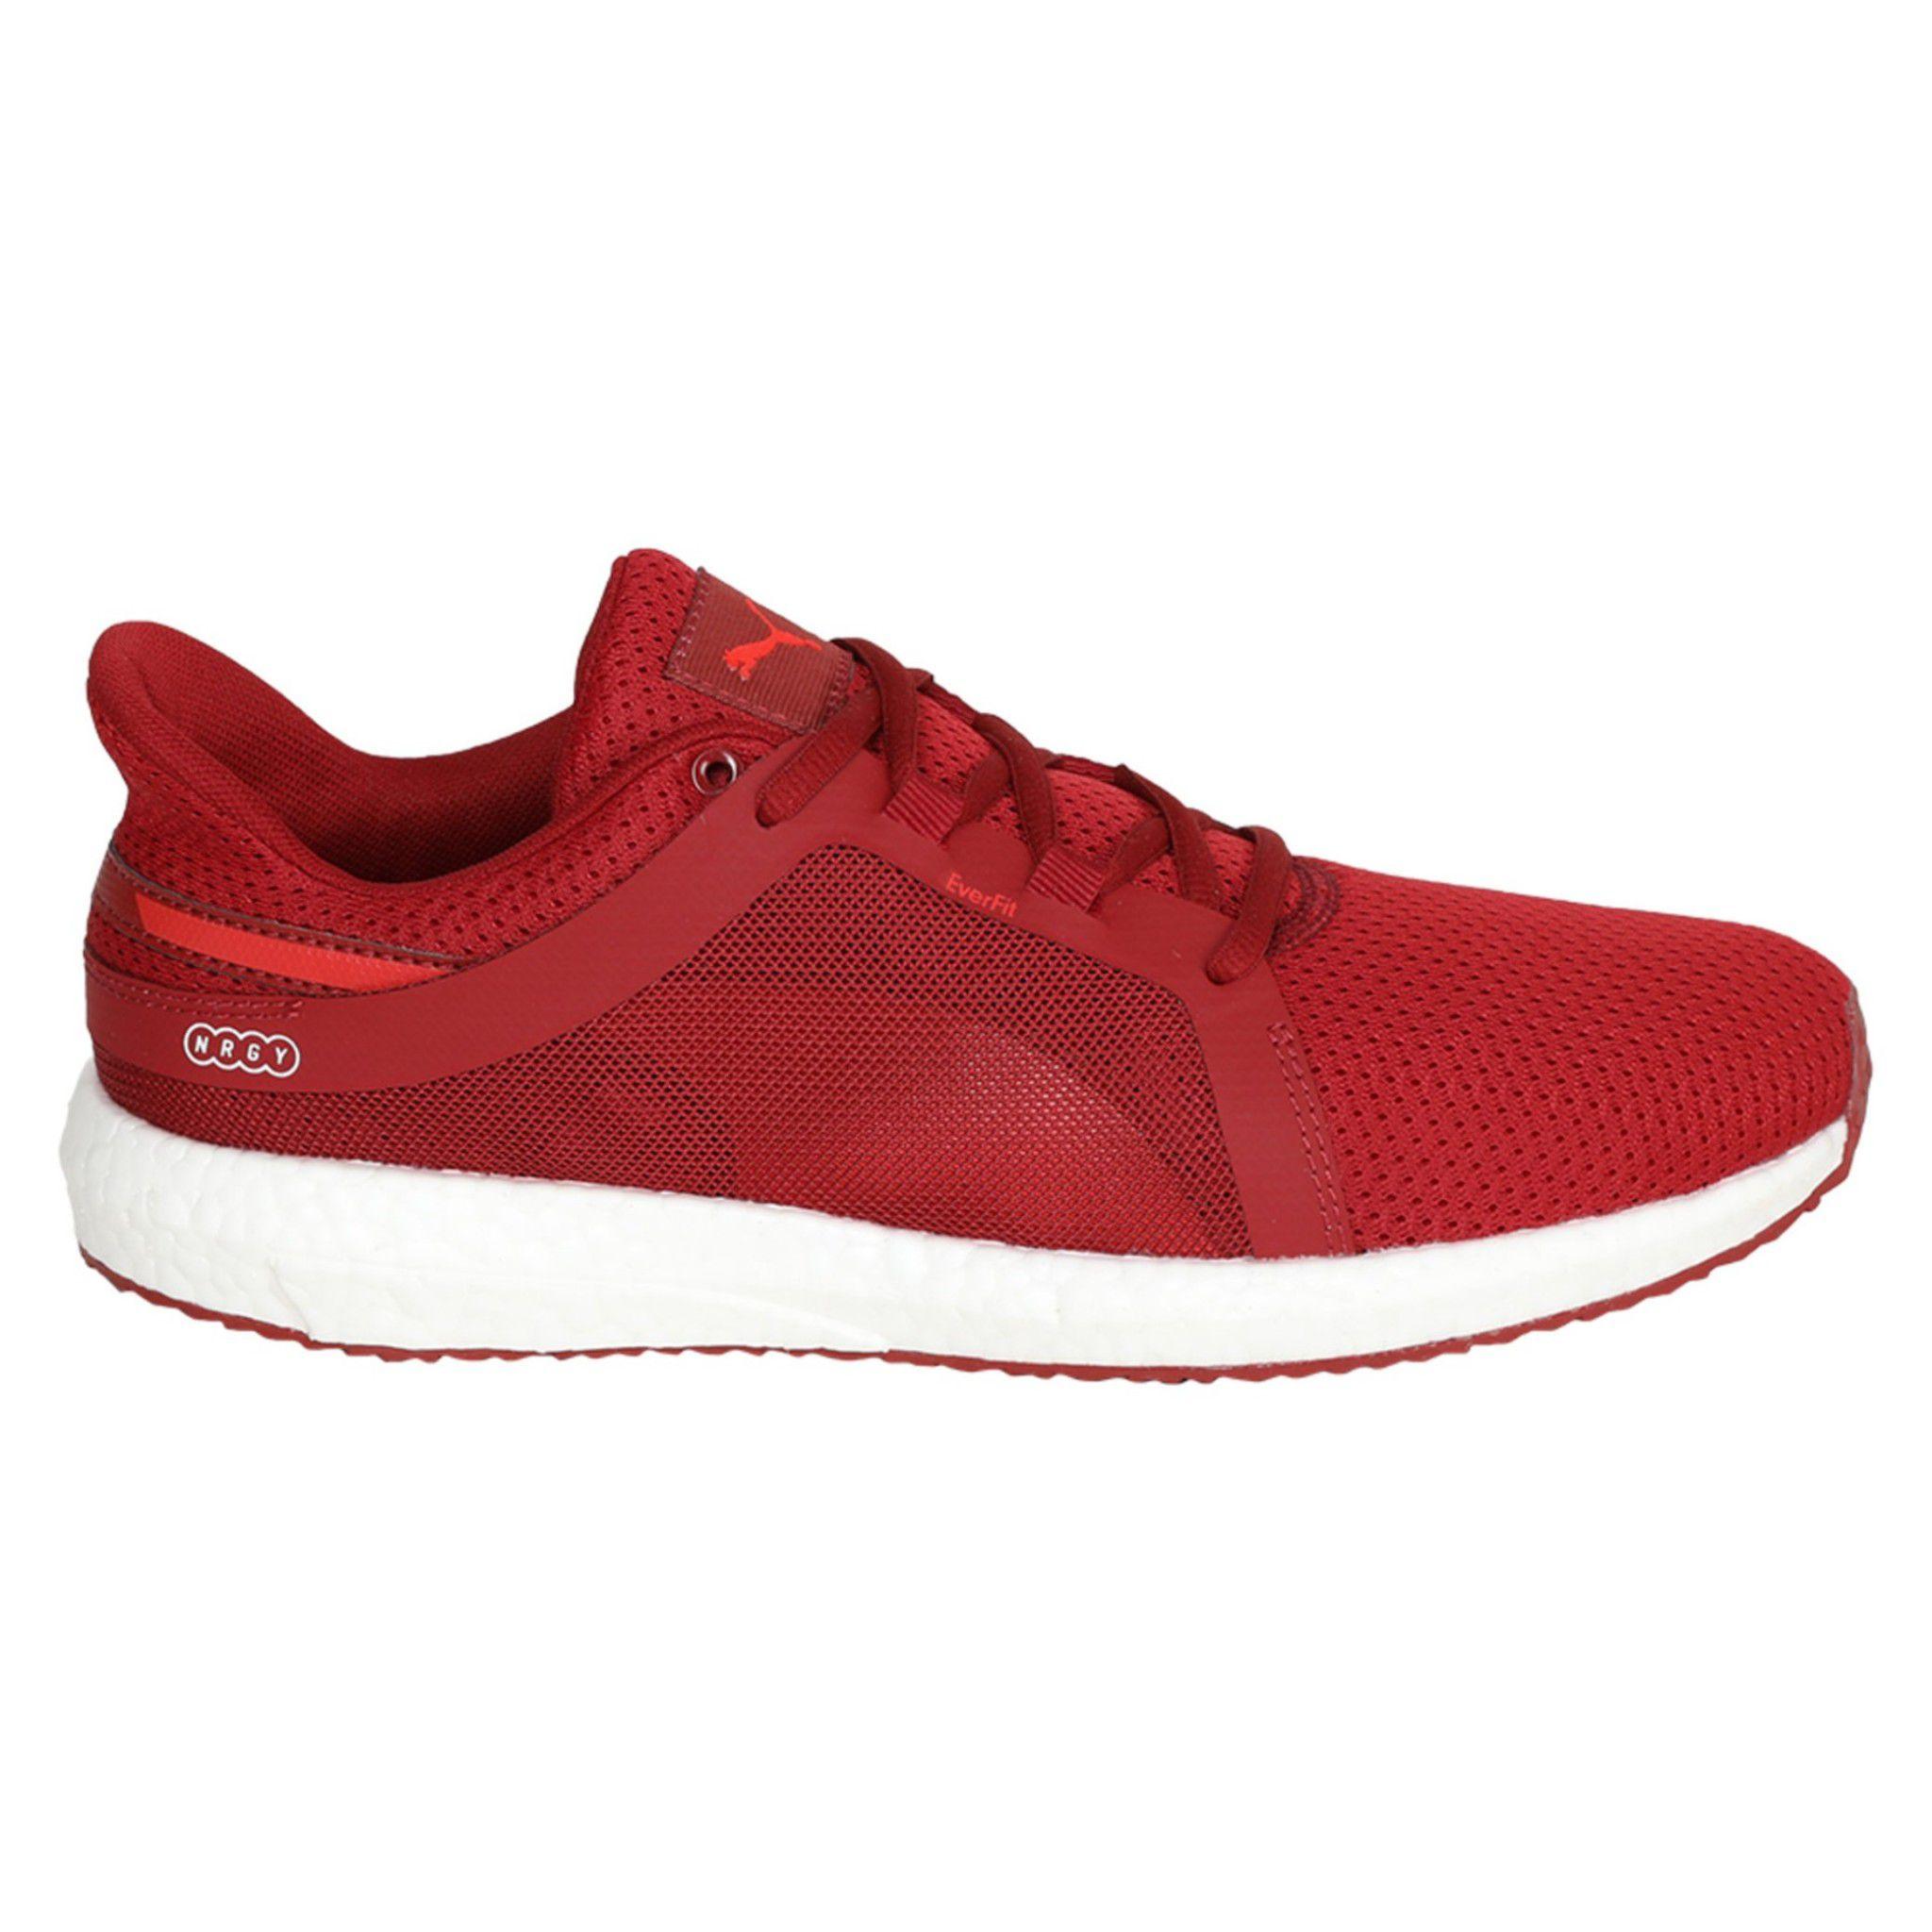 c3eceb80178 Puma Mega NRGY Turbo 2 Red Running Shoes - Buy Puma Mega NRGY Turbo ...